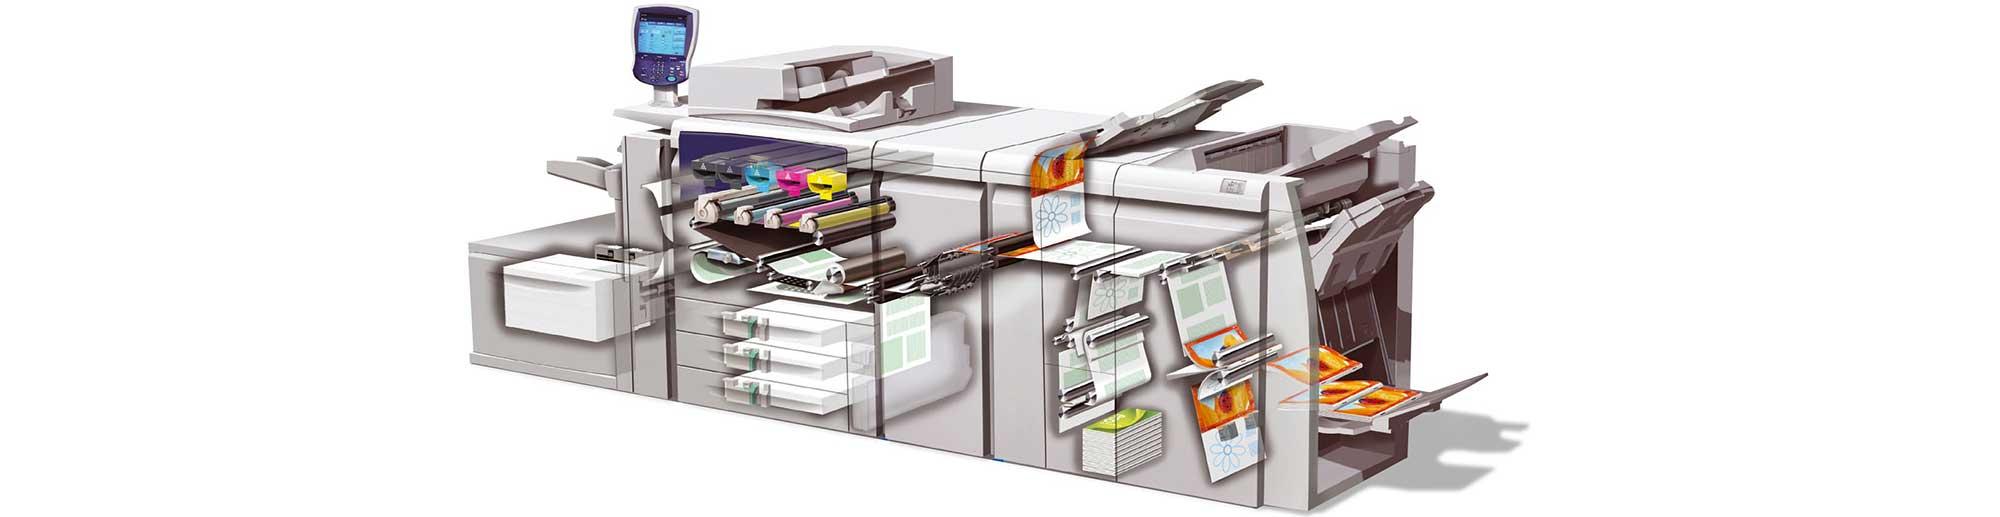 stampa digitale - seristampa